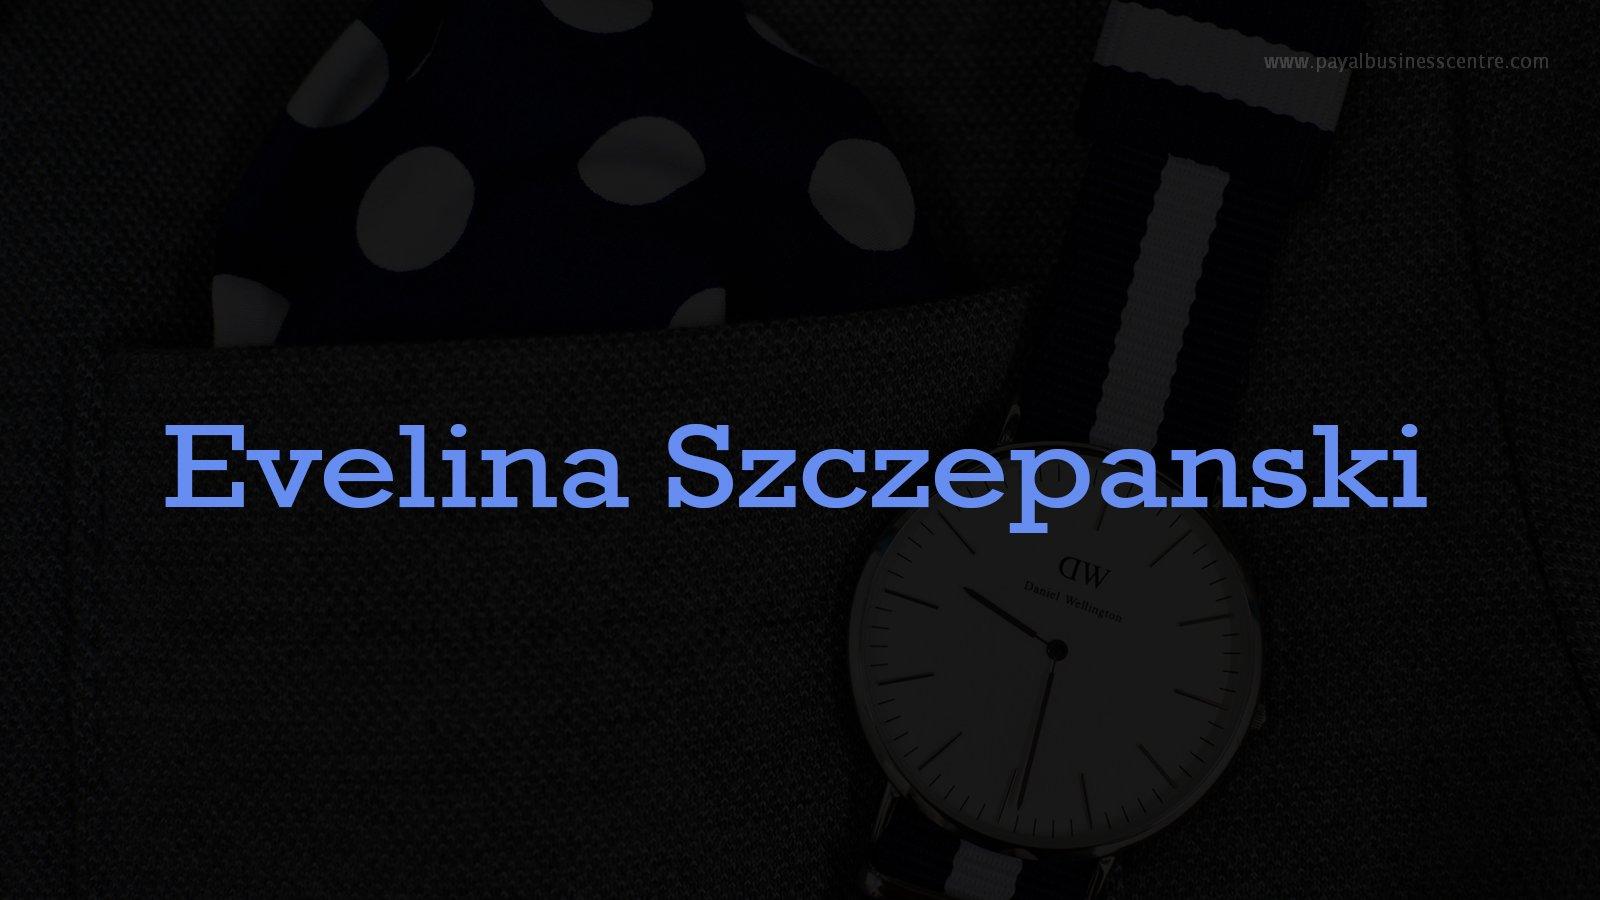 Evelina Szczepanski